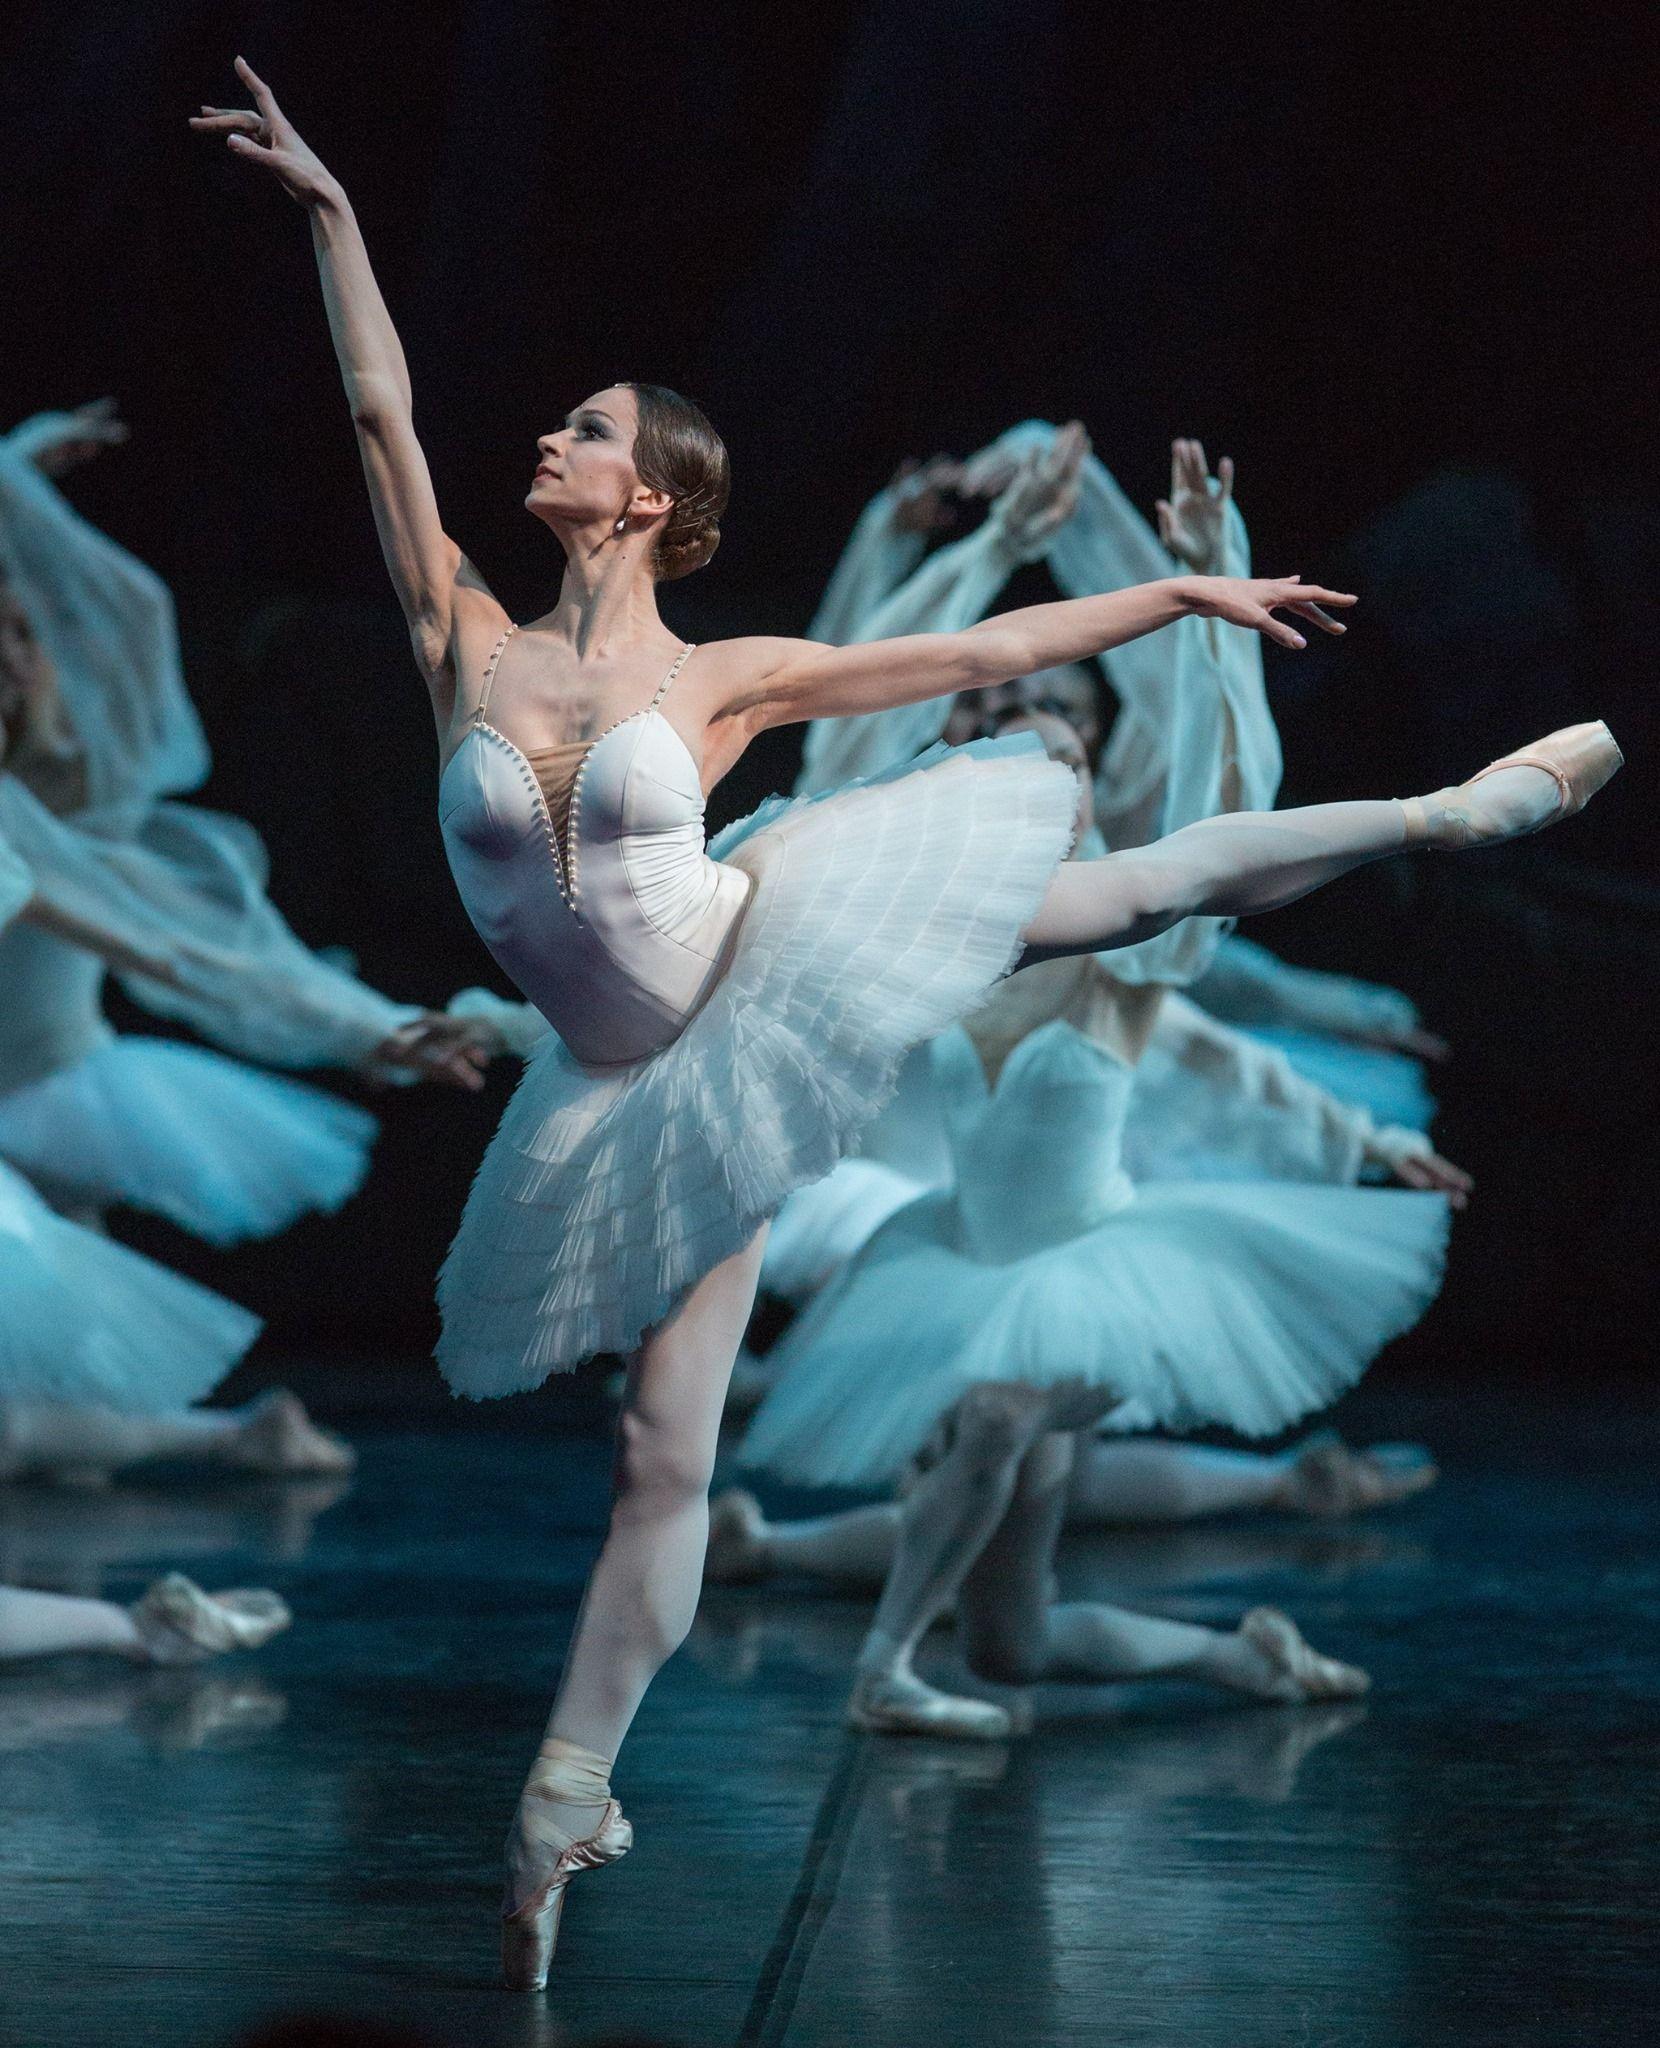 polina semionova in la bayadere at mikhailovsky theatre photo by stas levshin ダンサー バレリーナ グラフィック